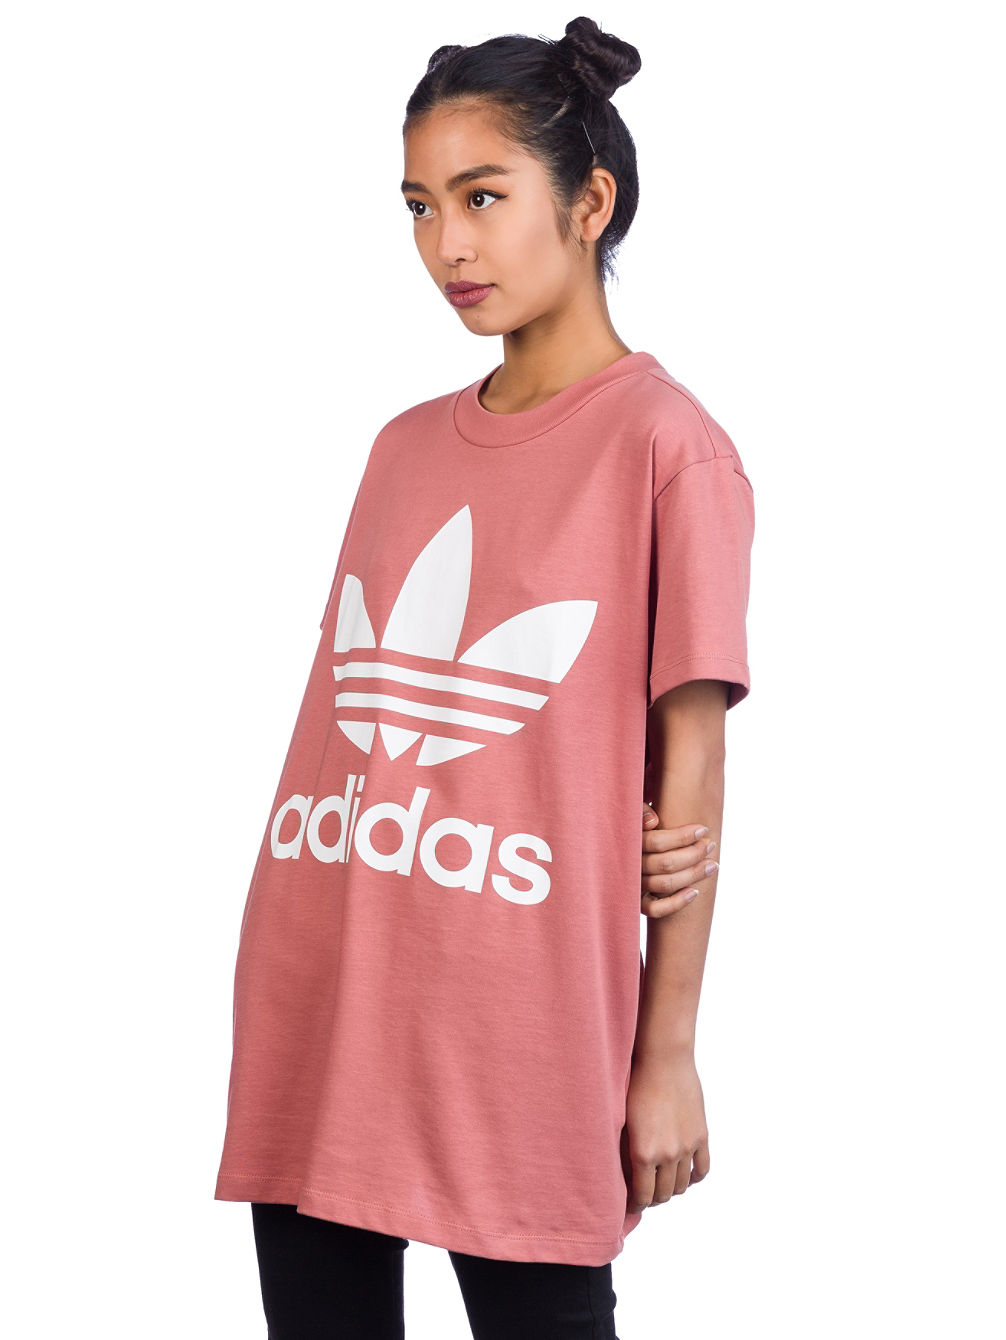 b4107d71e3f Womens Adidas Originals Orchid Trefoil T Shirt – EDGE Engineering ...